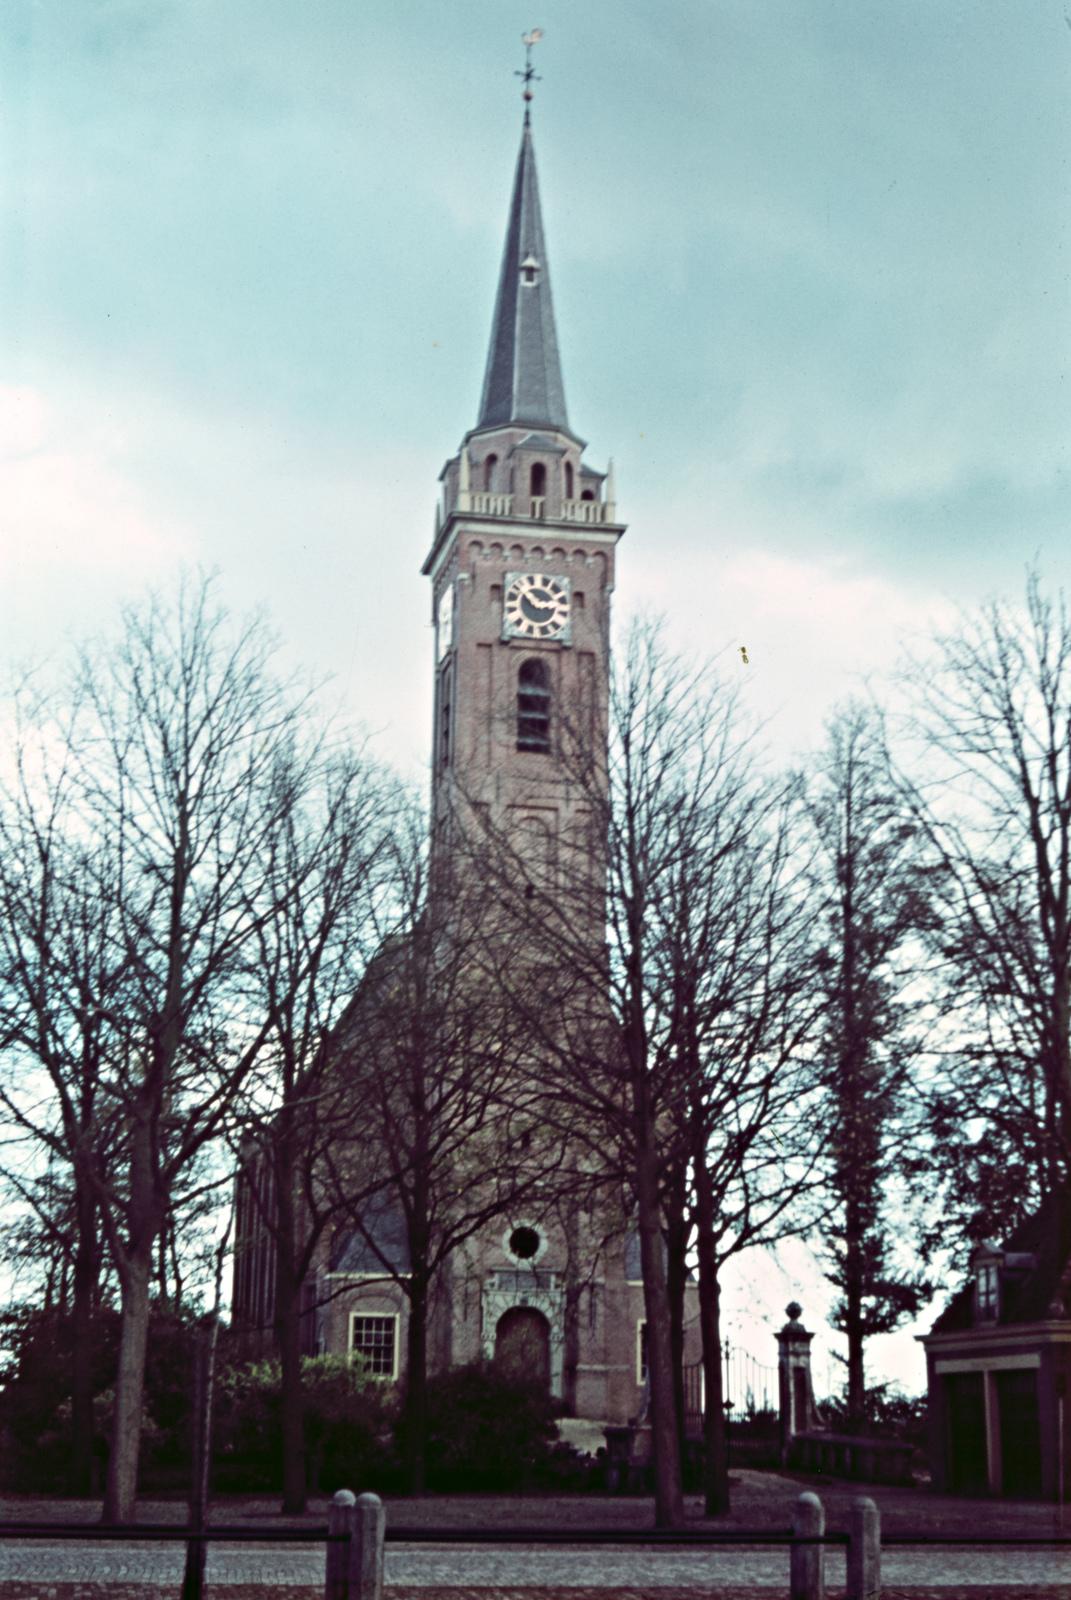 Hervormde kerk in Middenbeemster